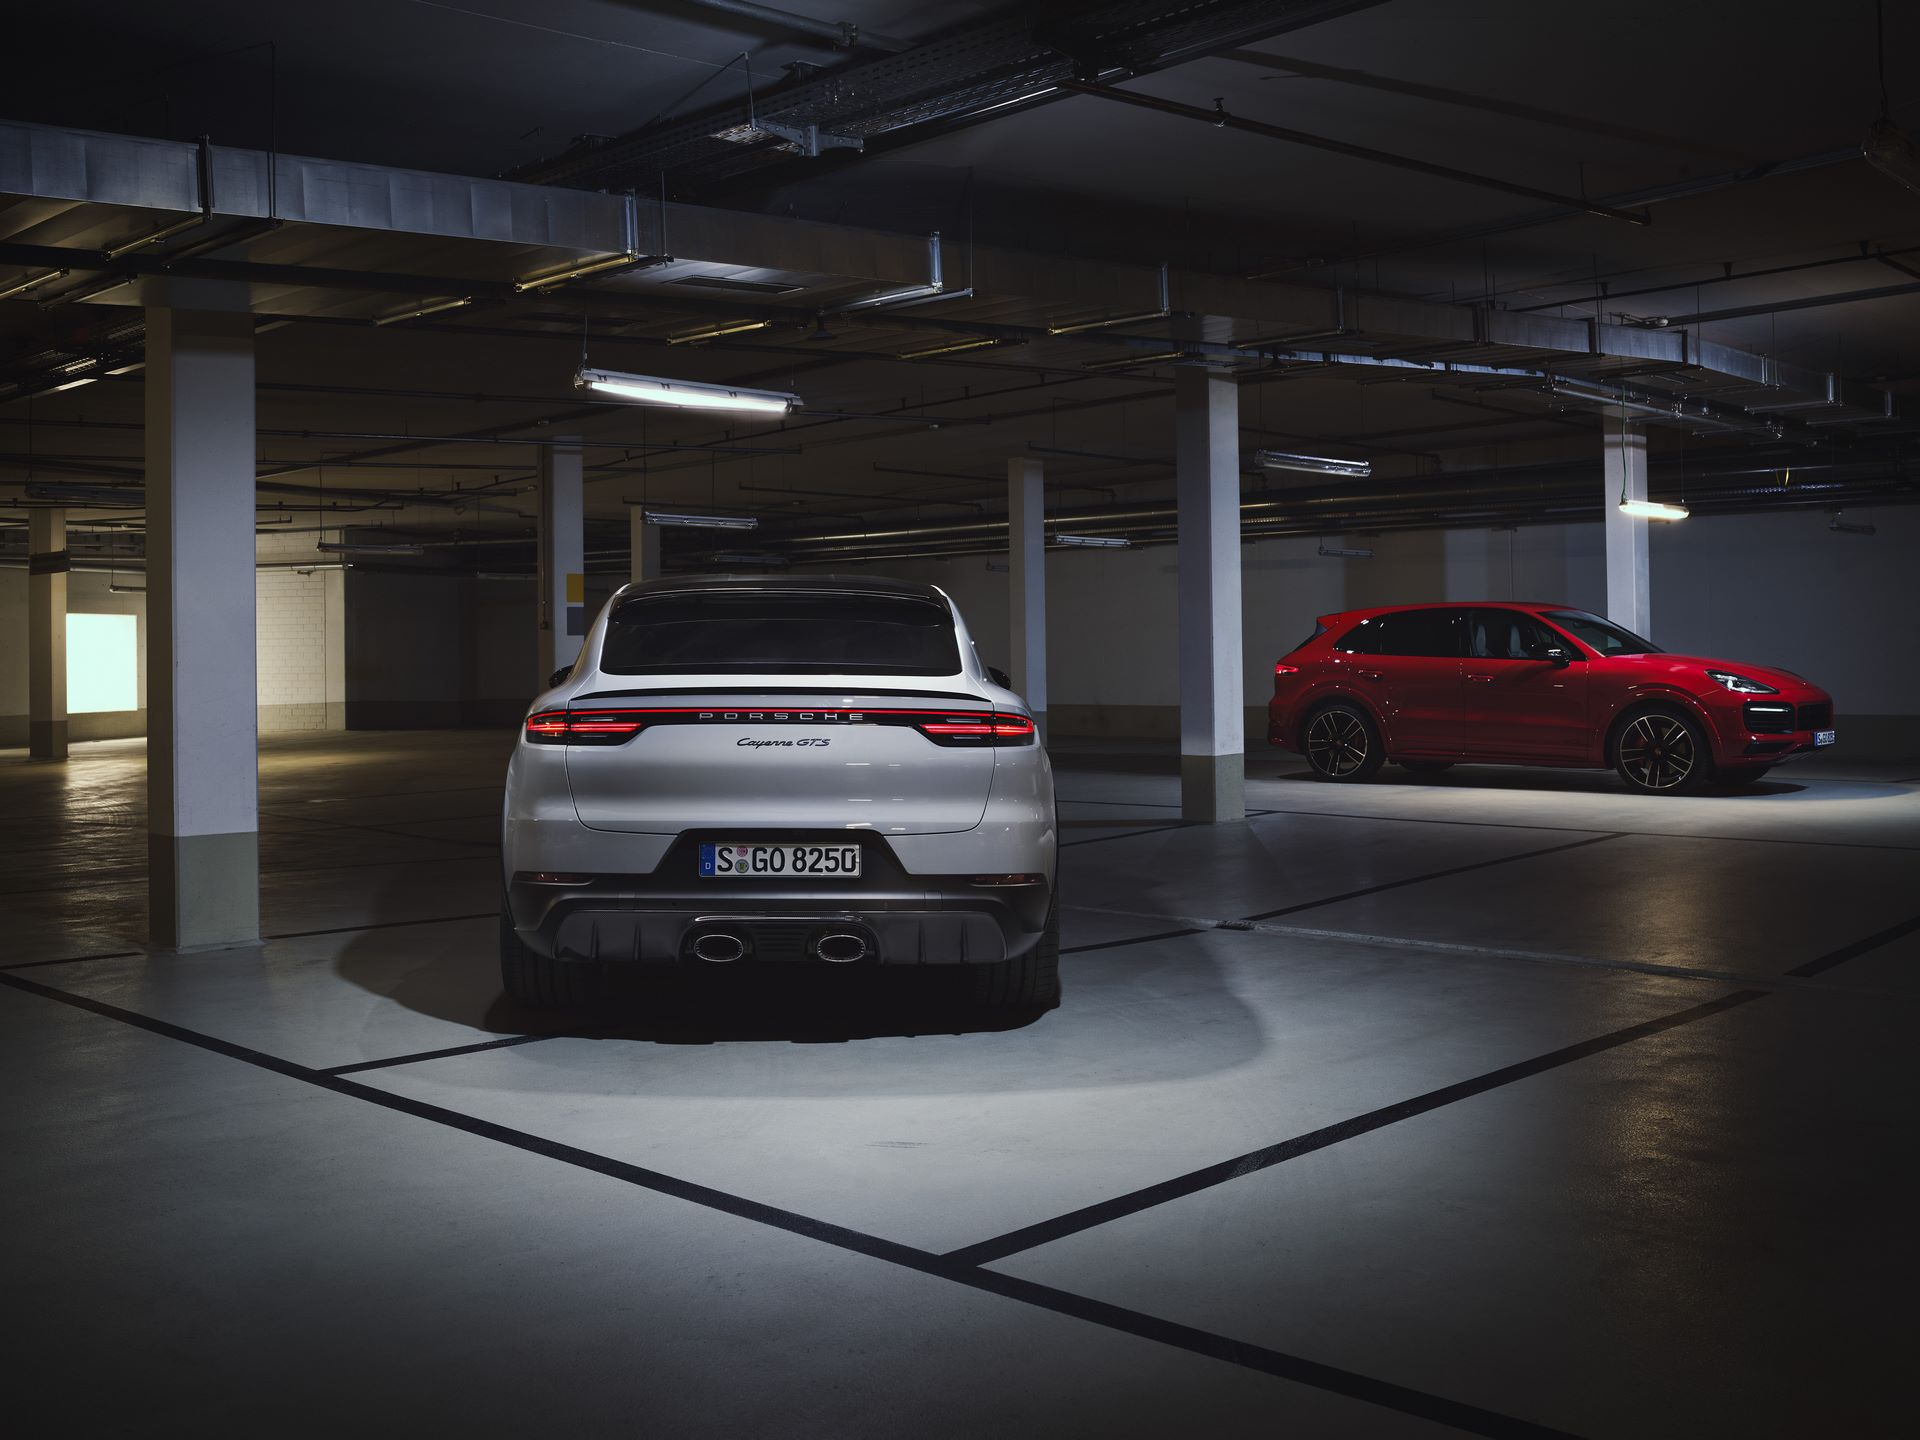 Porsche-Cayenne-GTS-and-Cayenne-GTS-Coupe-2021-4